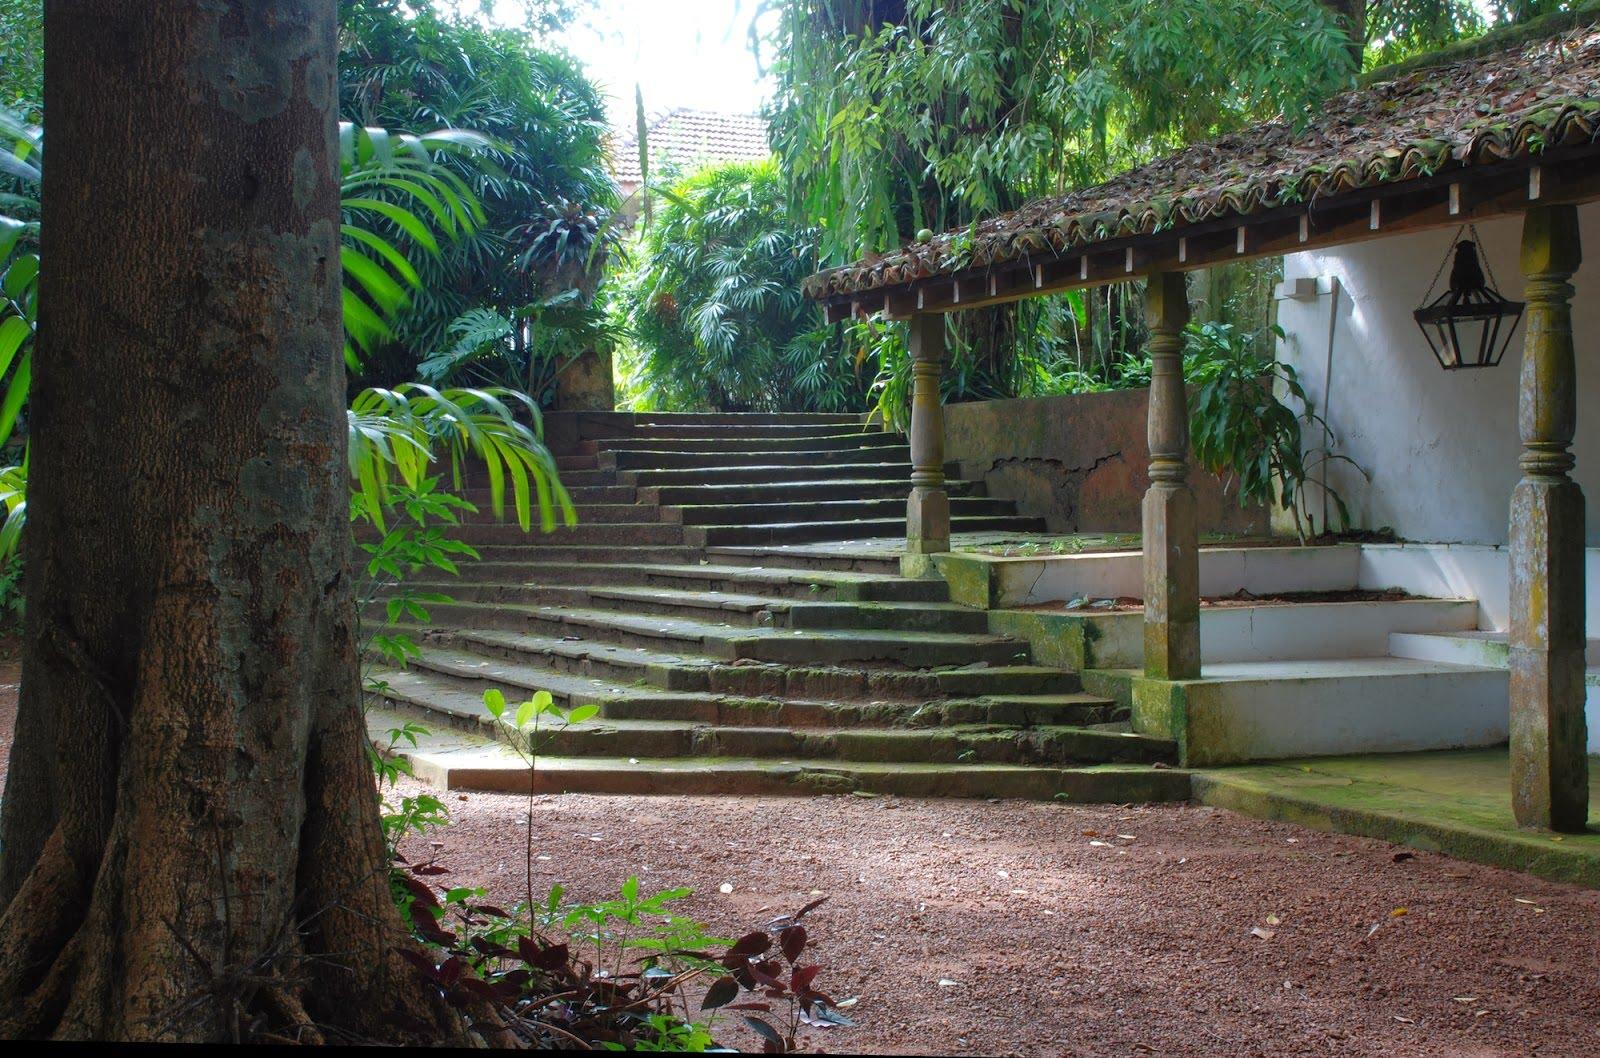 Bawa Lunuganga 52b0a5e2e8e44ee81300004d_remembering-bawa_12_e_-_lunuganga_-_bawa-s_garden_and_estate- (1).jpg